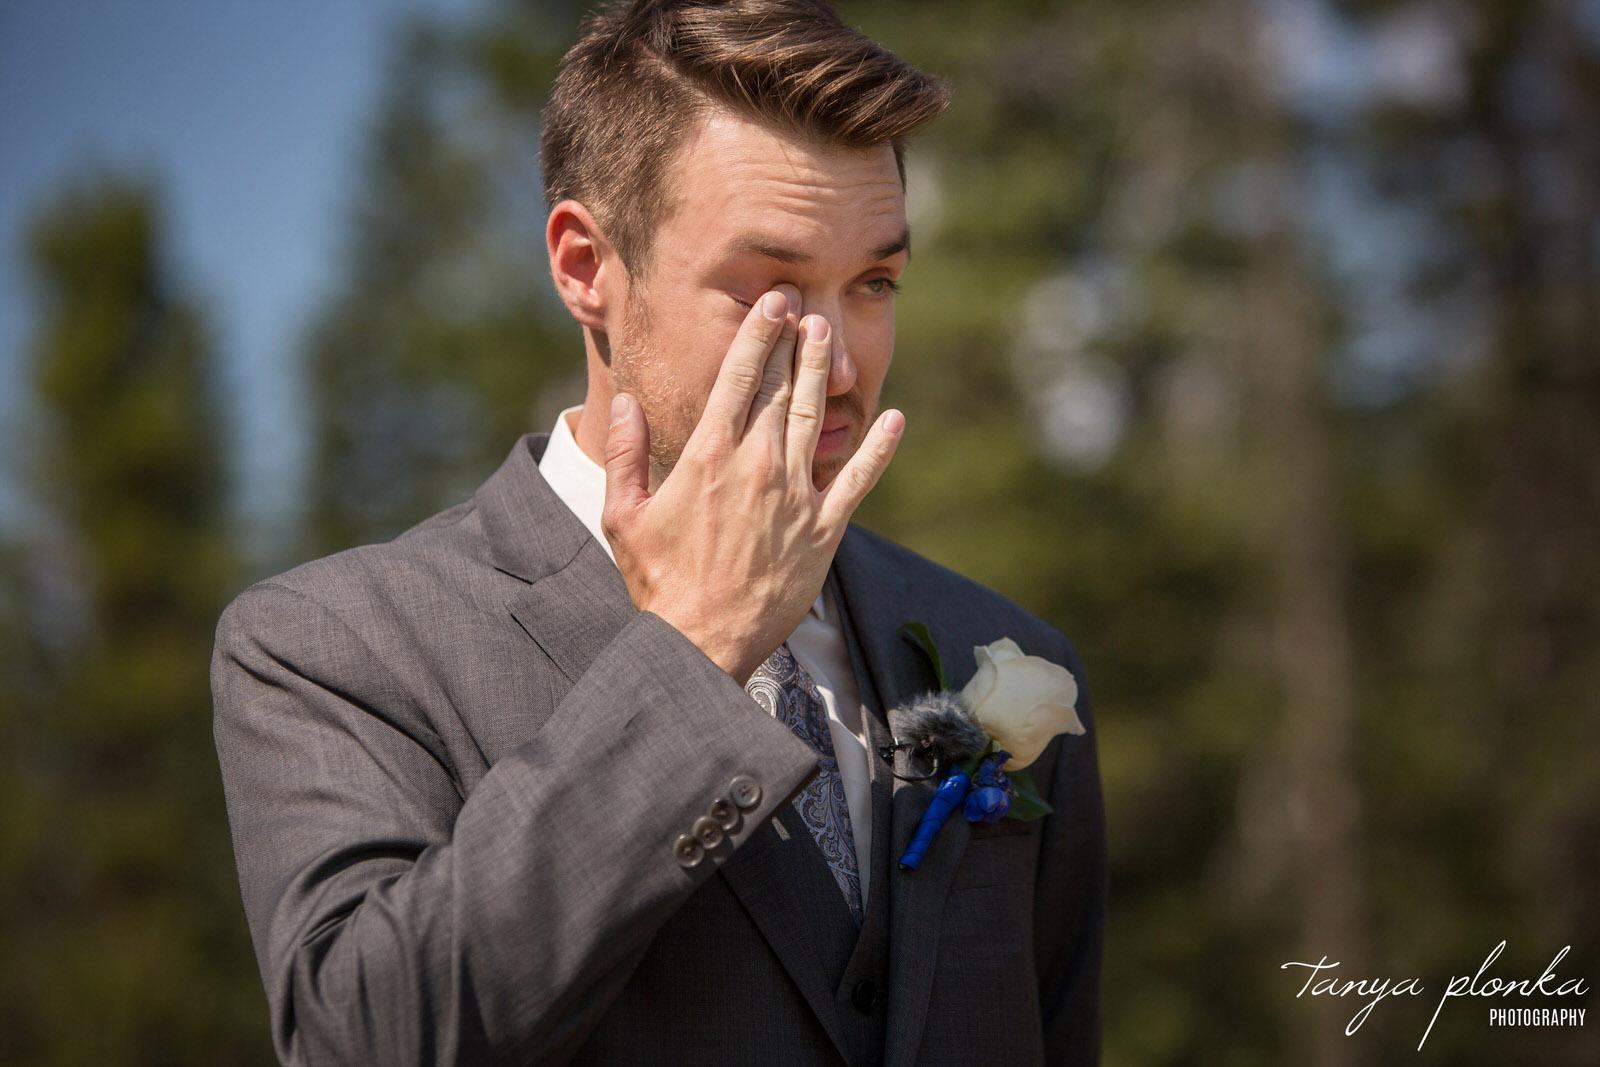 emotional groom wipes away tear at wedding ceremony in Banff